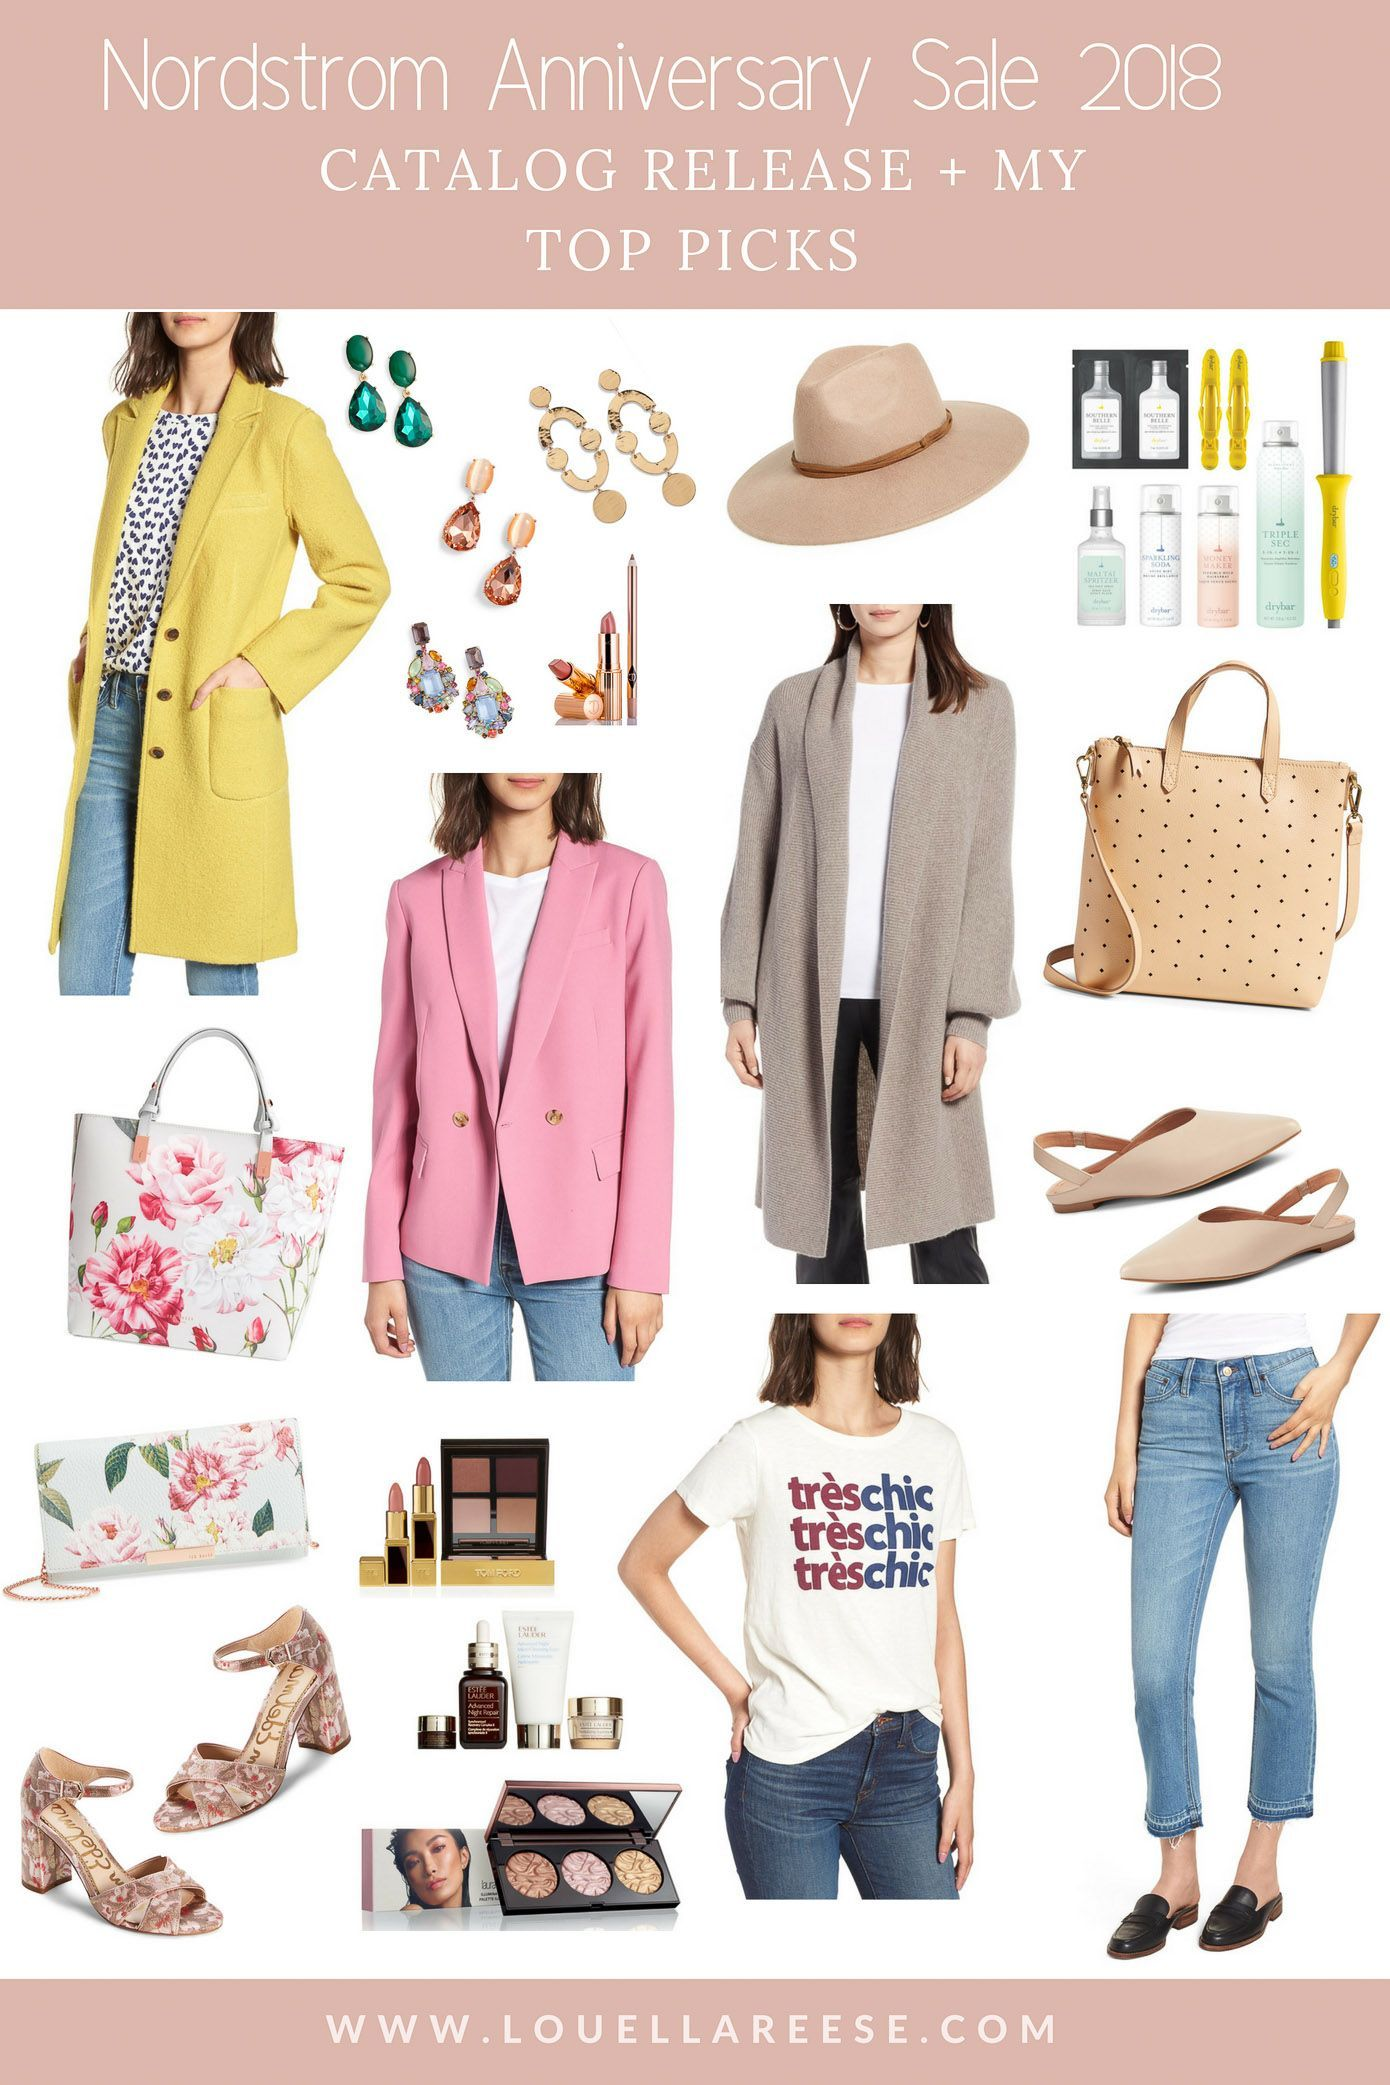 2018 Nordstrom Anniversary Sale FAQ + Top Picks | Louella Reese ...